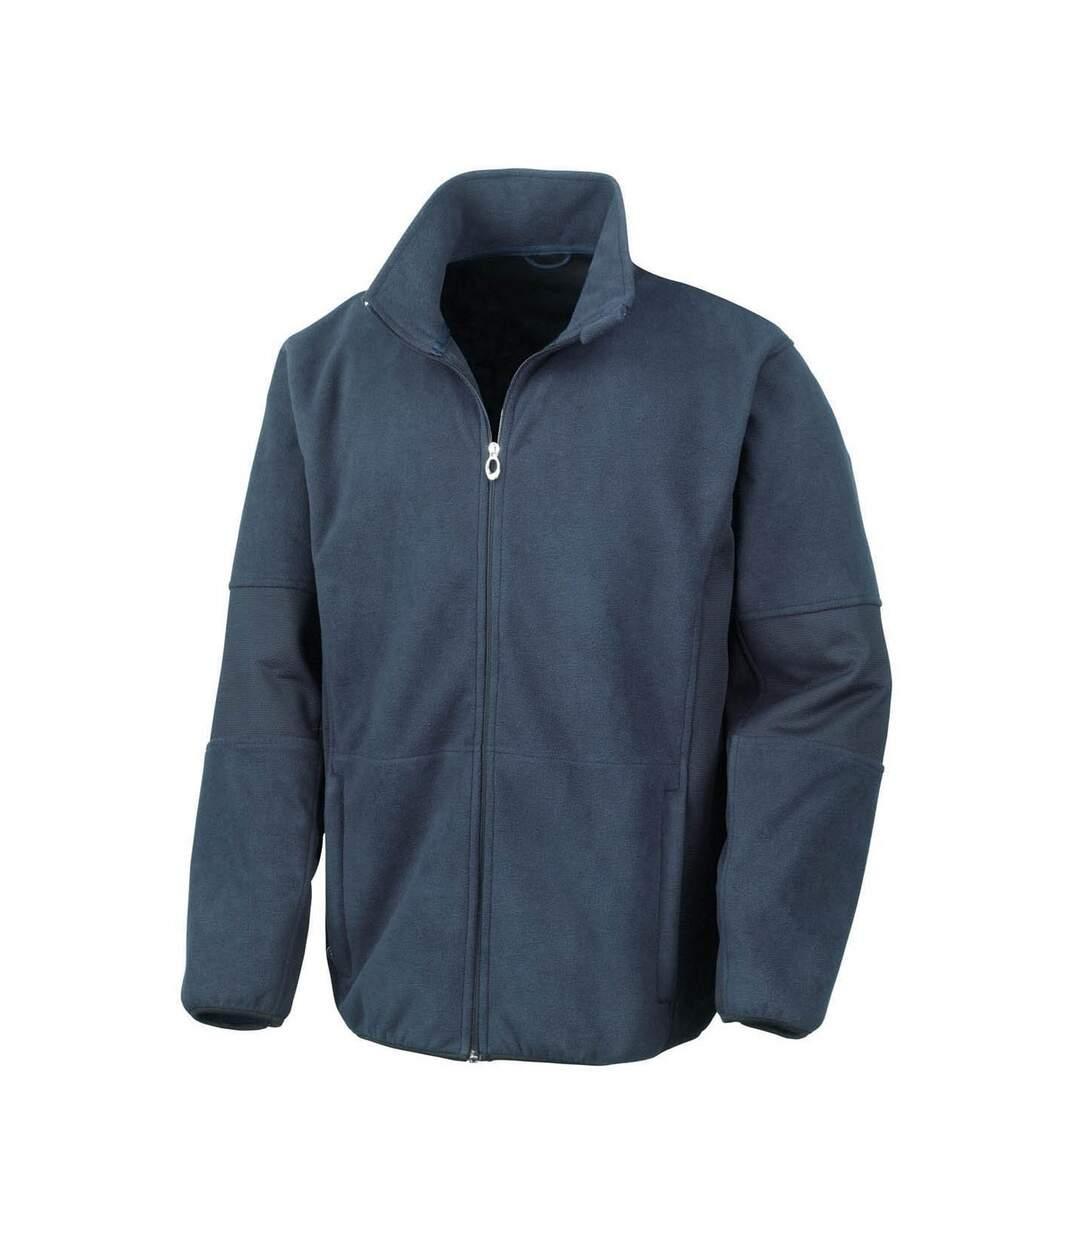 Result Mens Osaka TECH Performance Combined Pile Softshell Waterproof Windproof Jacket (Navy Blue) - UTBC867